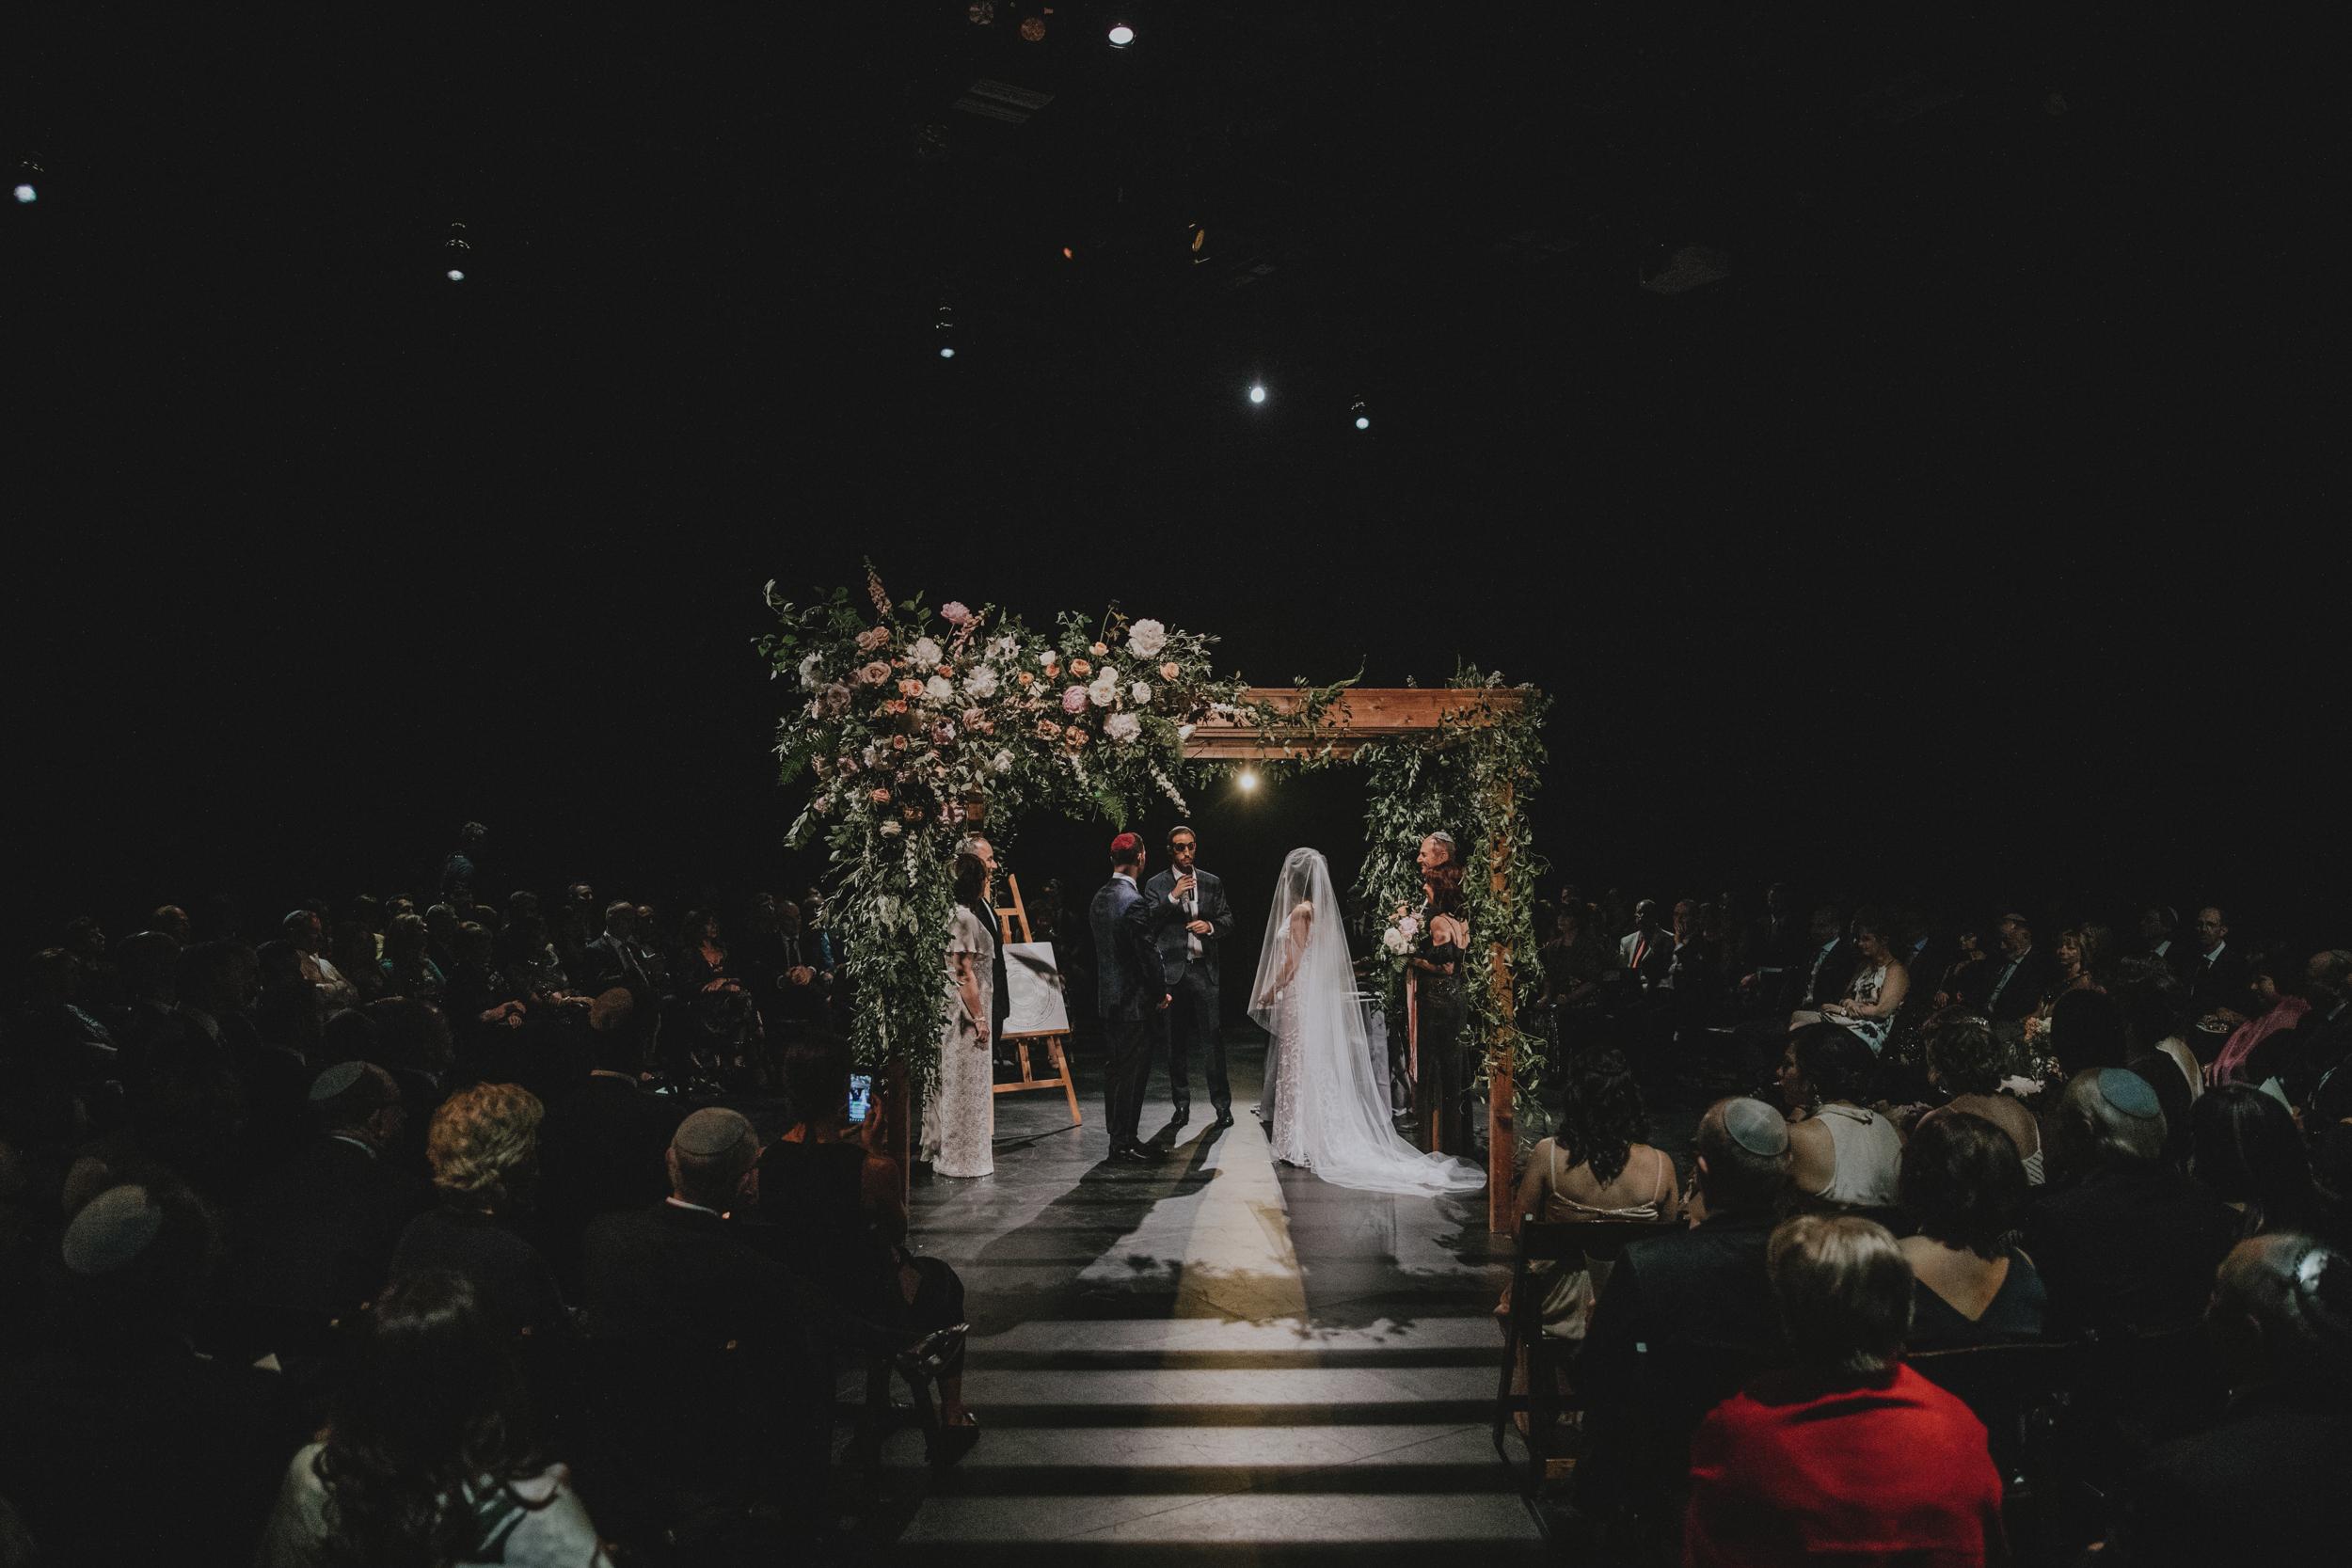 Yaletown-Roundhouse-City-Wedding-4.jpg